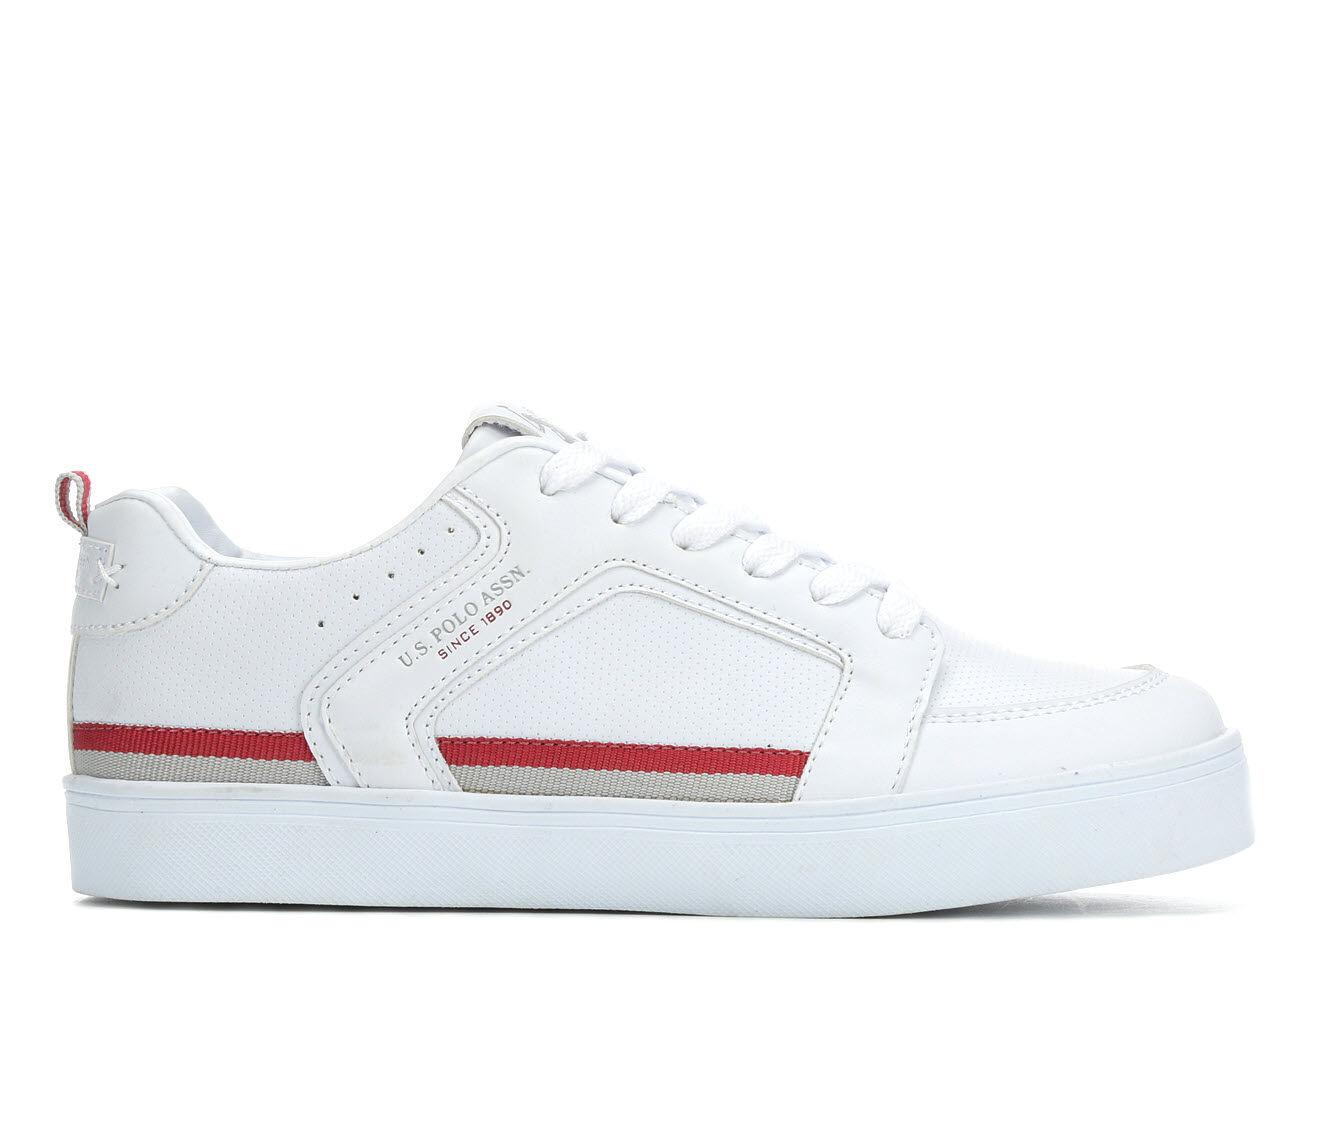 Women's US Polo Assn Prime Sneakers White